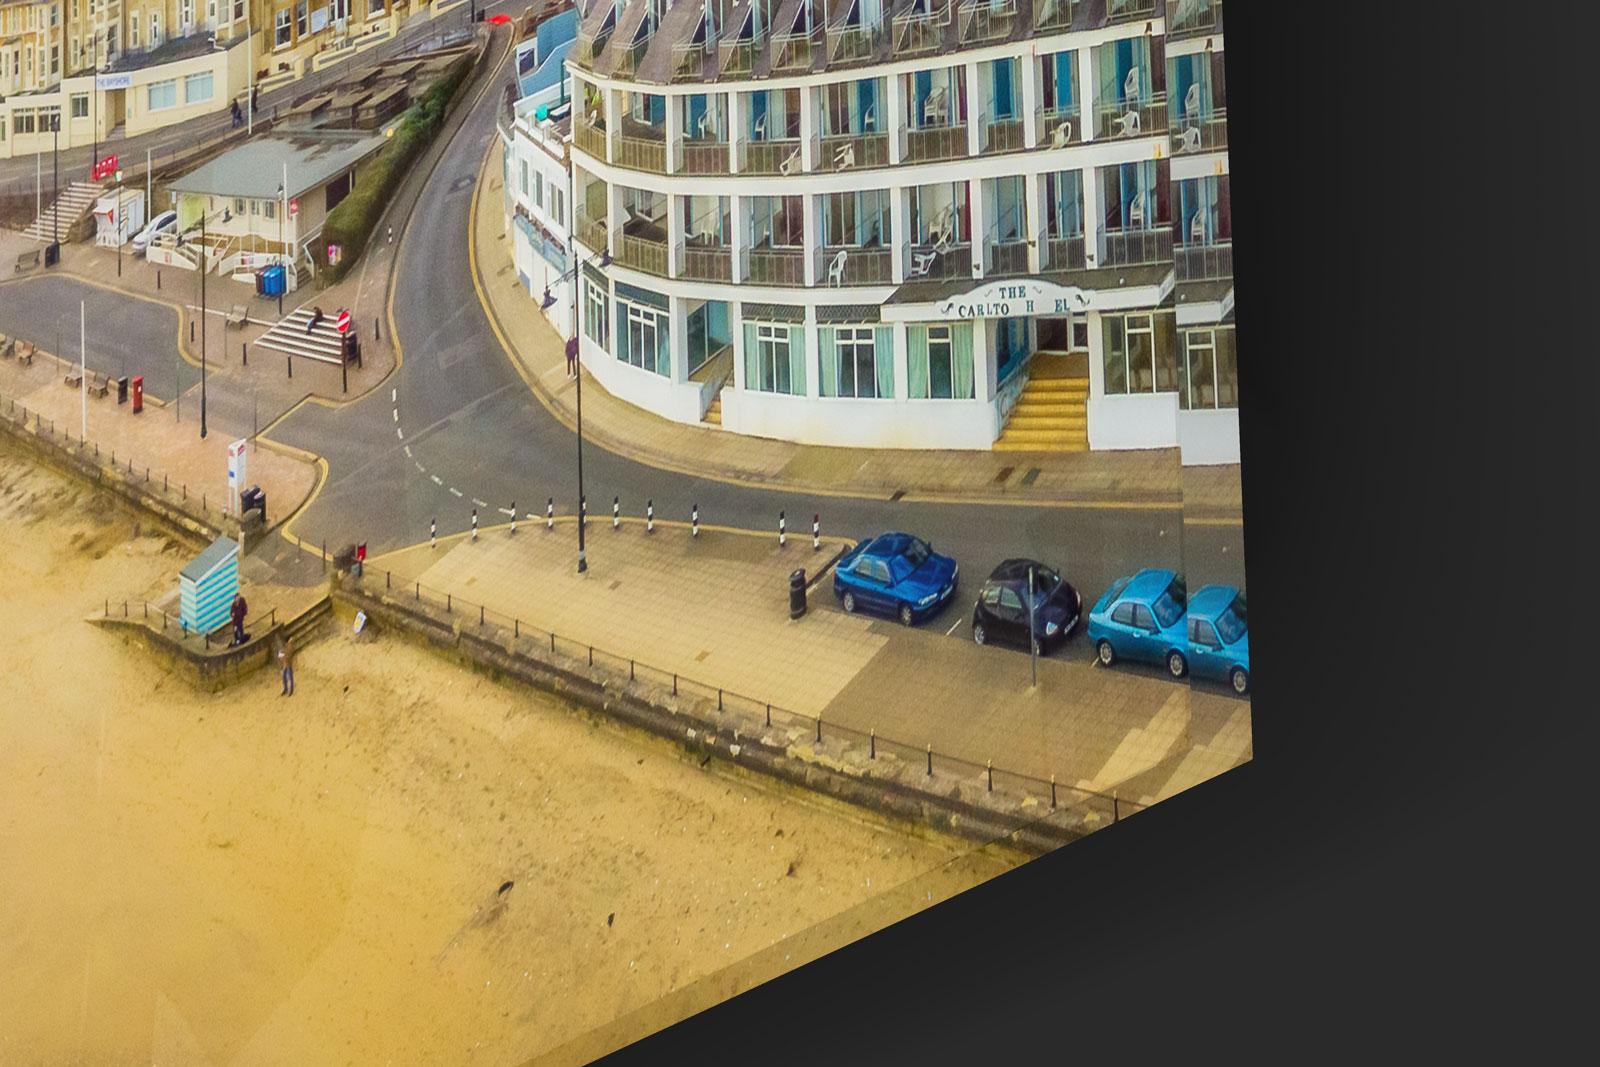 Sandown-Pier-bottom-right.jpg